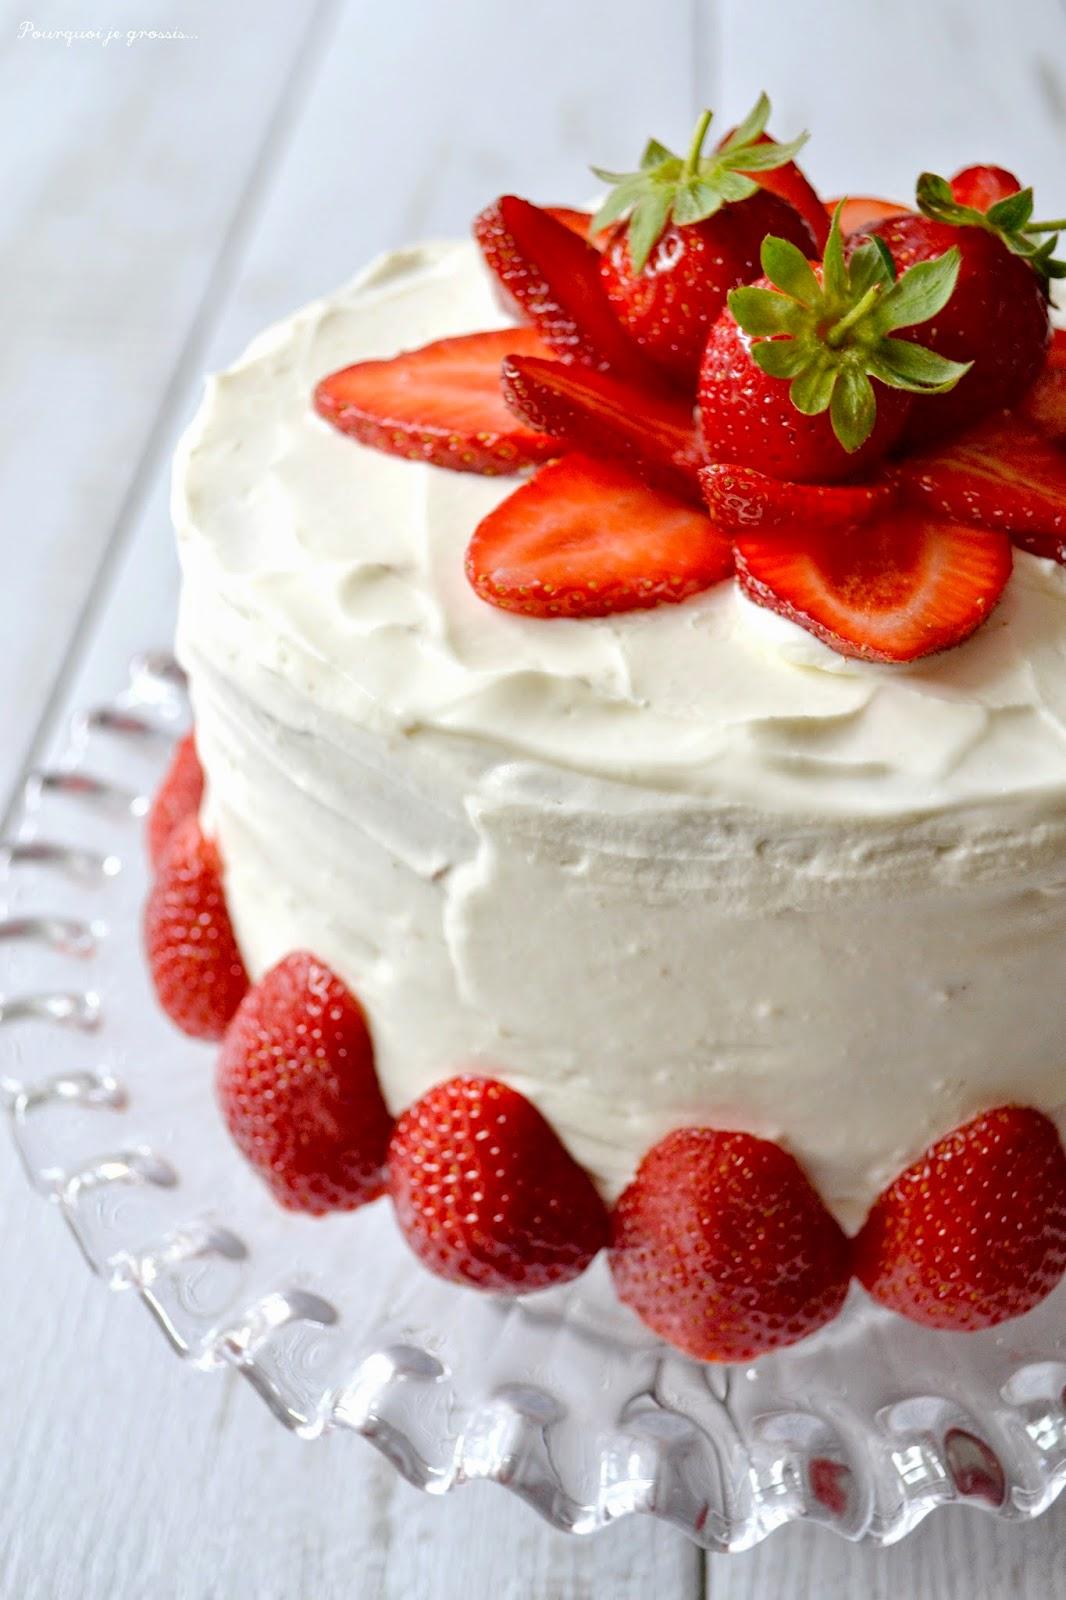 Pourquoi je grossis layer cake fraises citron for Pourquoi je grossis